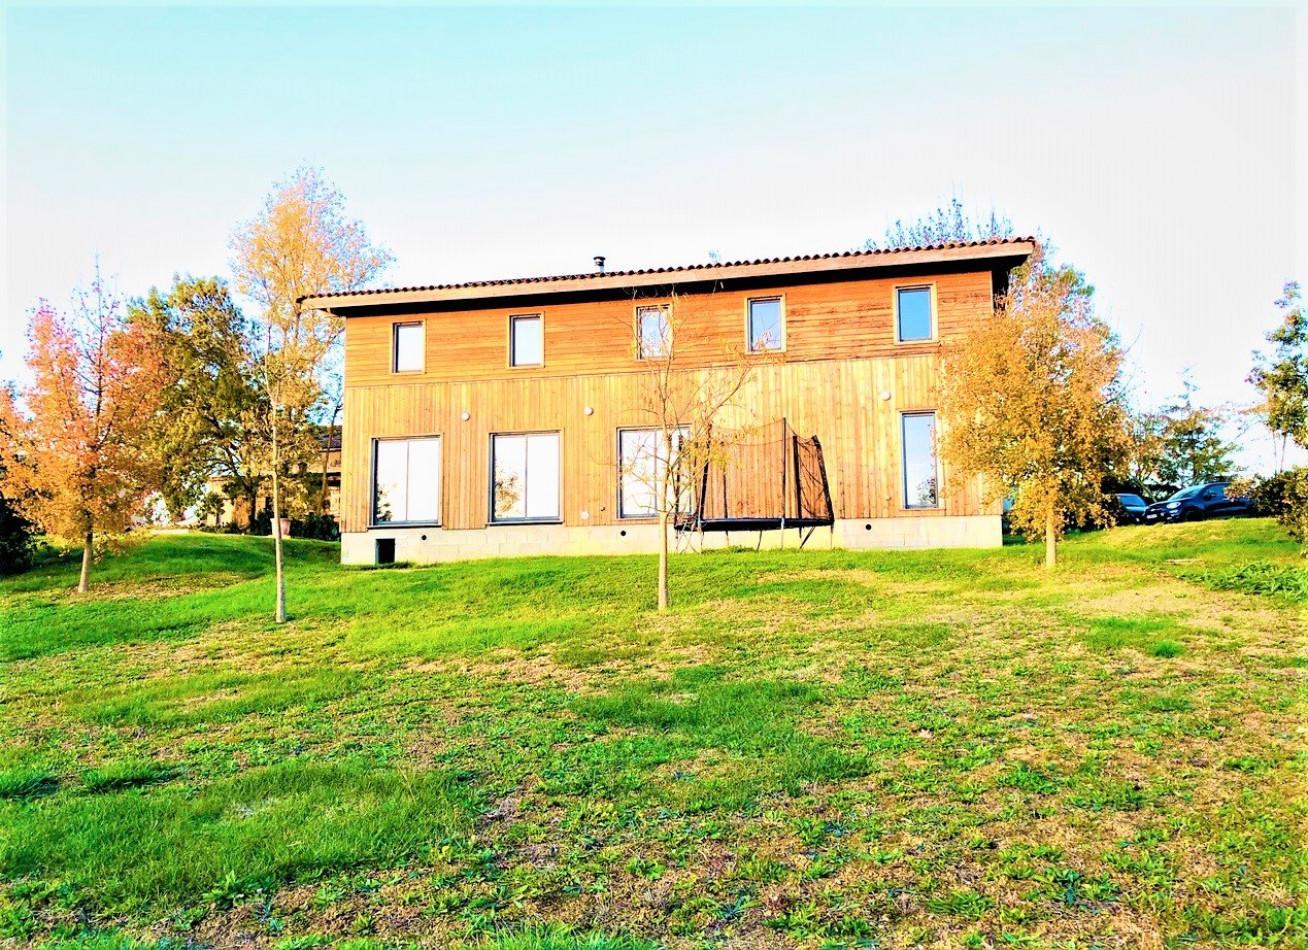 A vendre Bourg Saint Bernard 31212130 Synergie immobilier